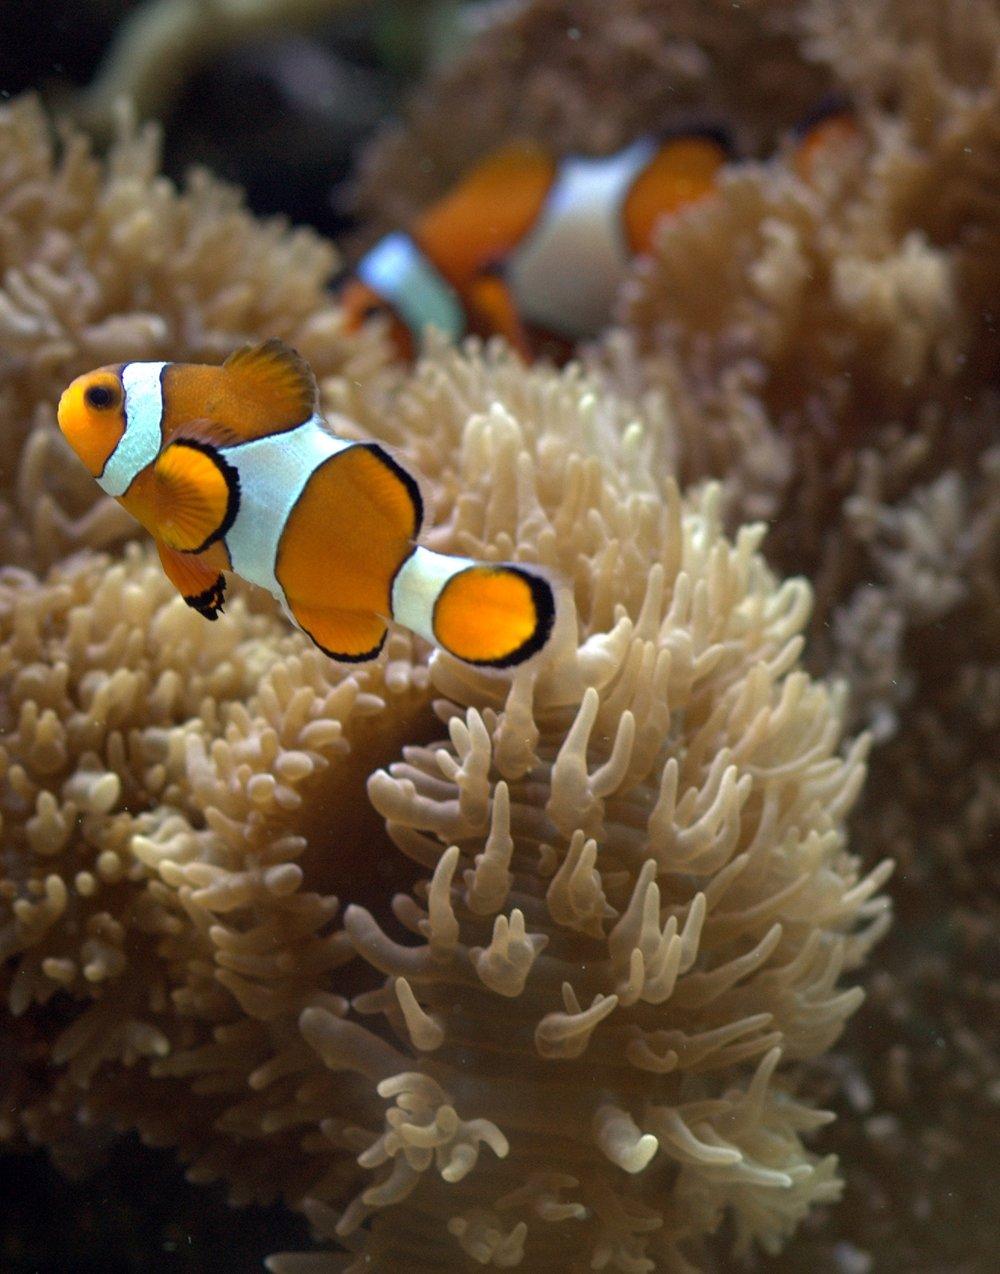 clownfish swimming in an aquarium